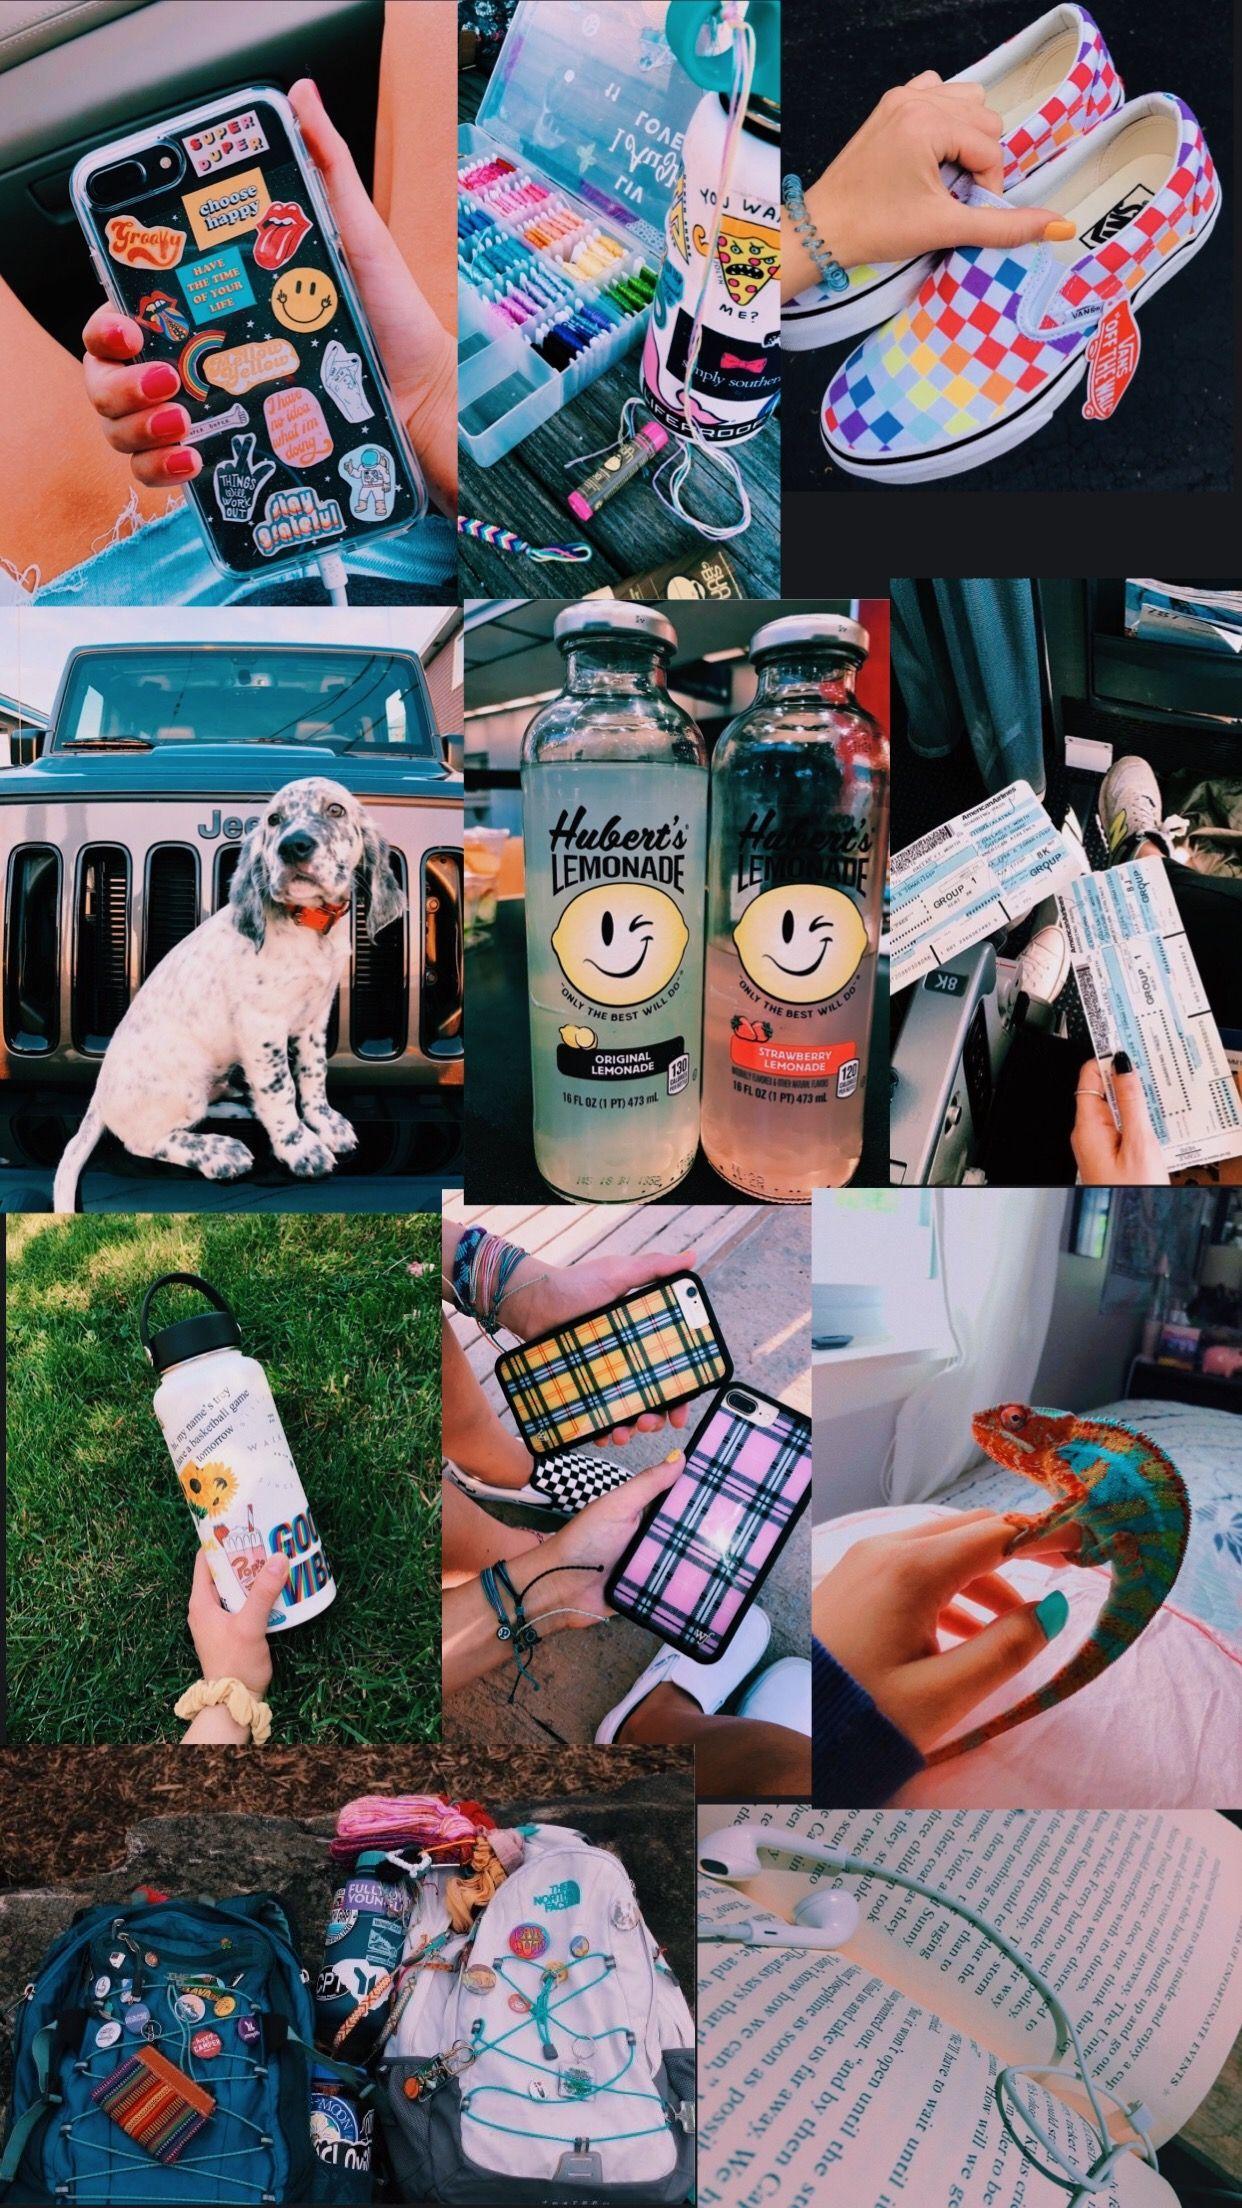 Pin By Ashlyne Healey On Summa Aesthetic Collage Summer